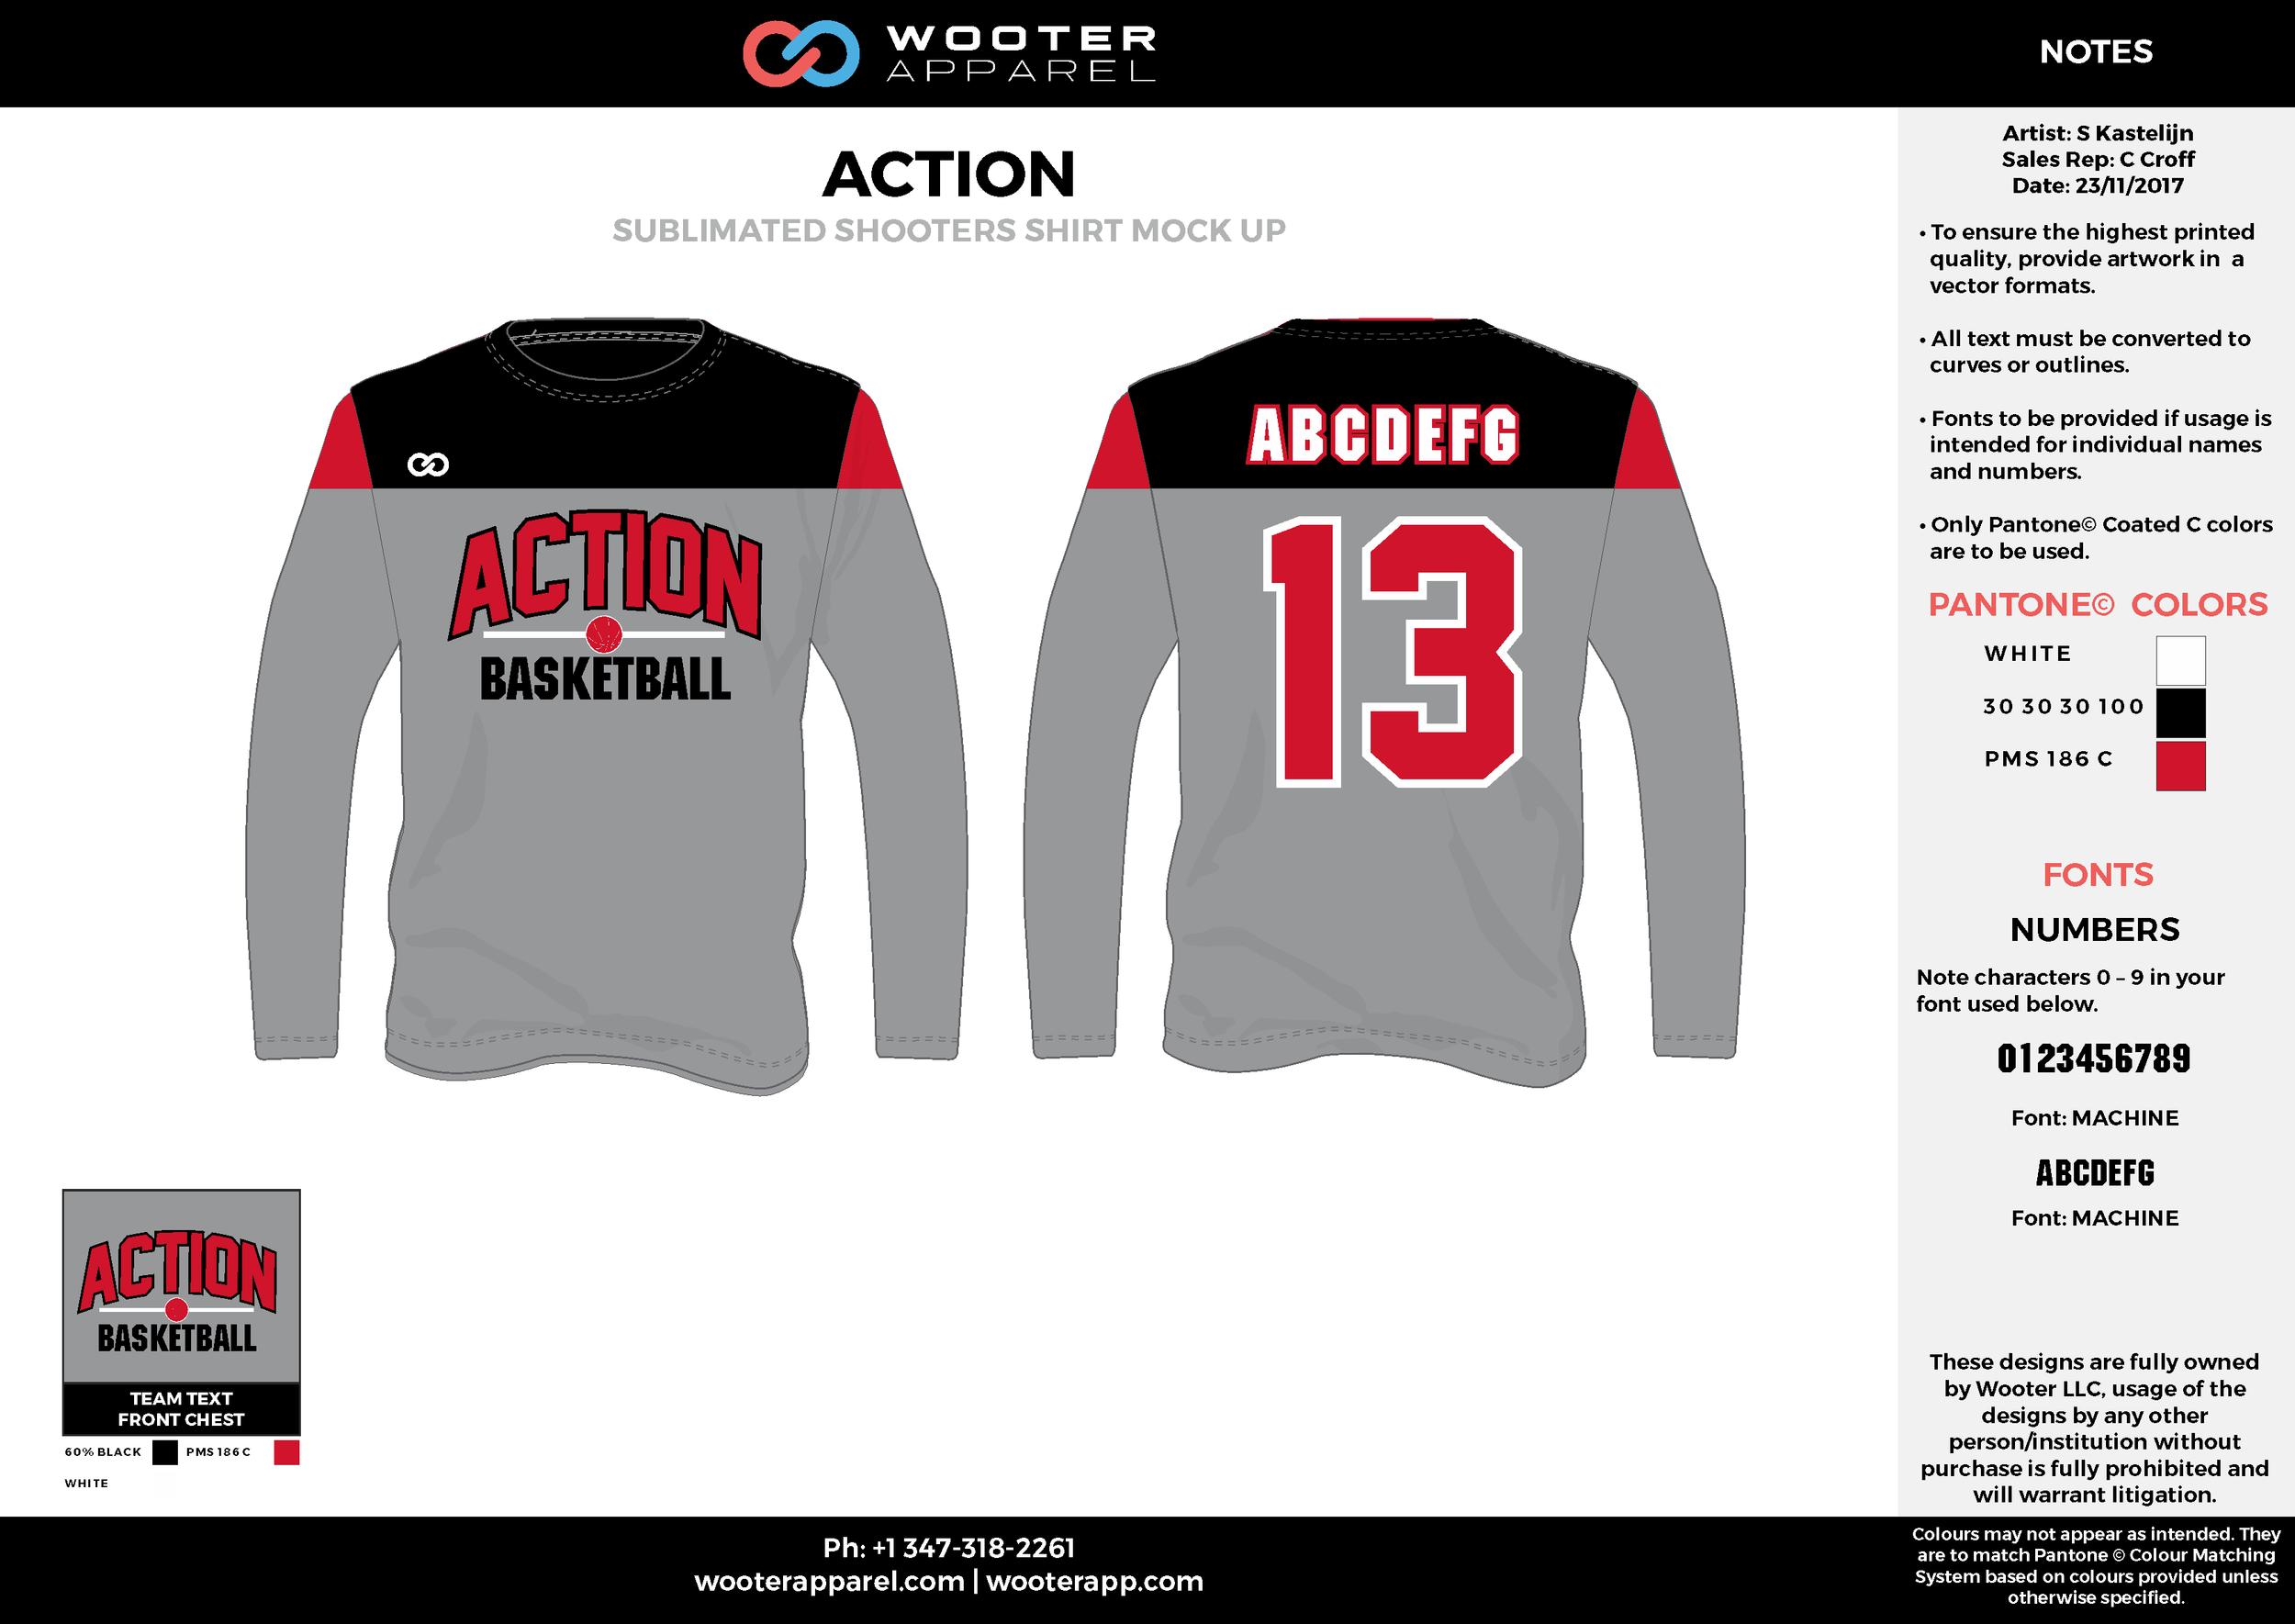 ACTION red gray black white Basketball Long Sleeve Shooting Shirt